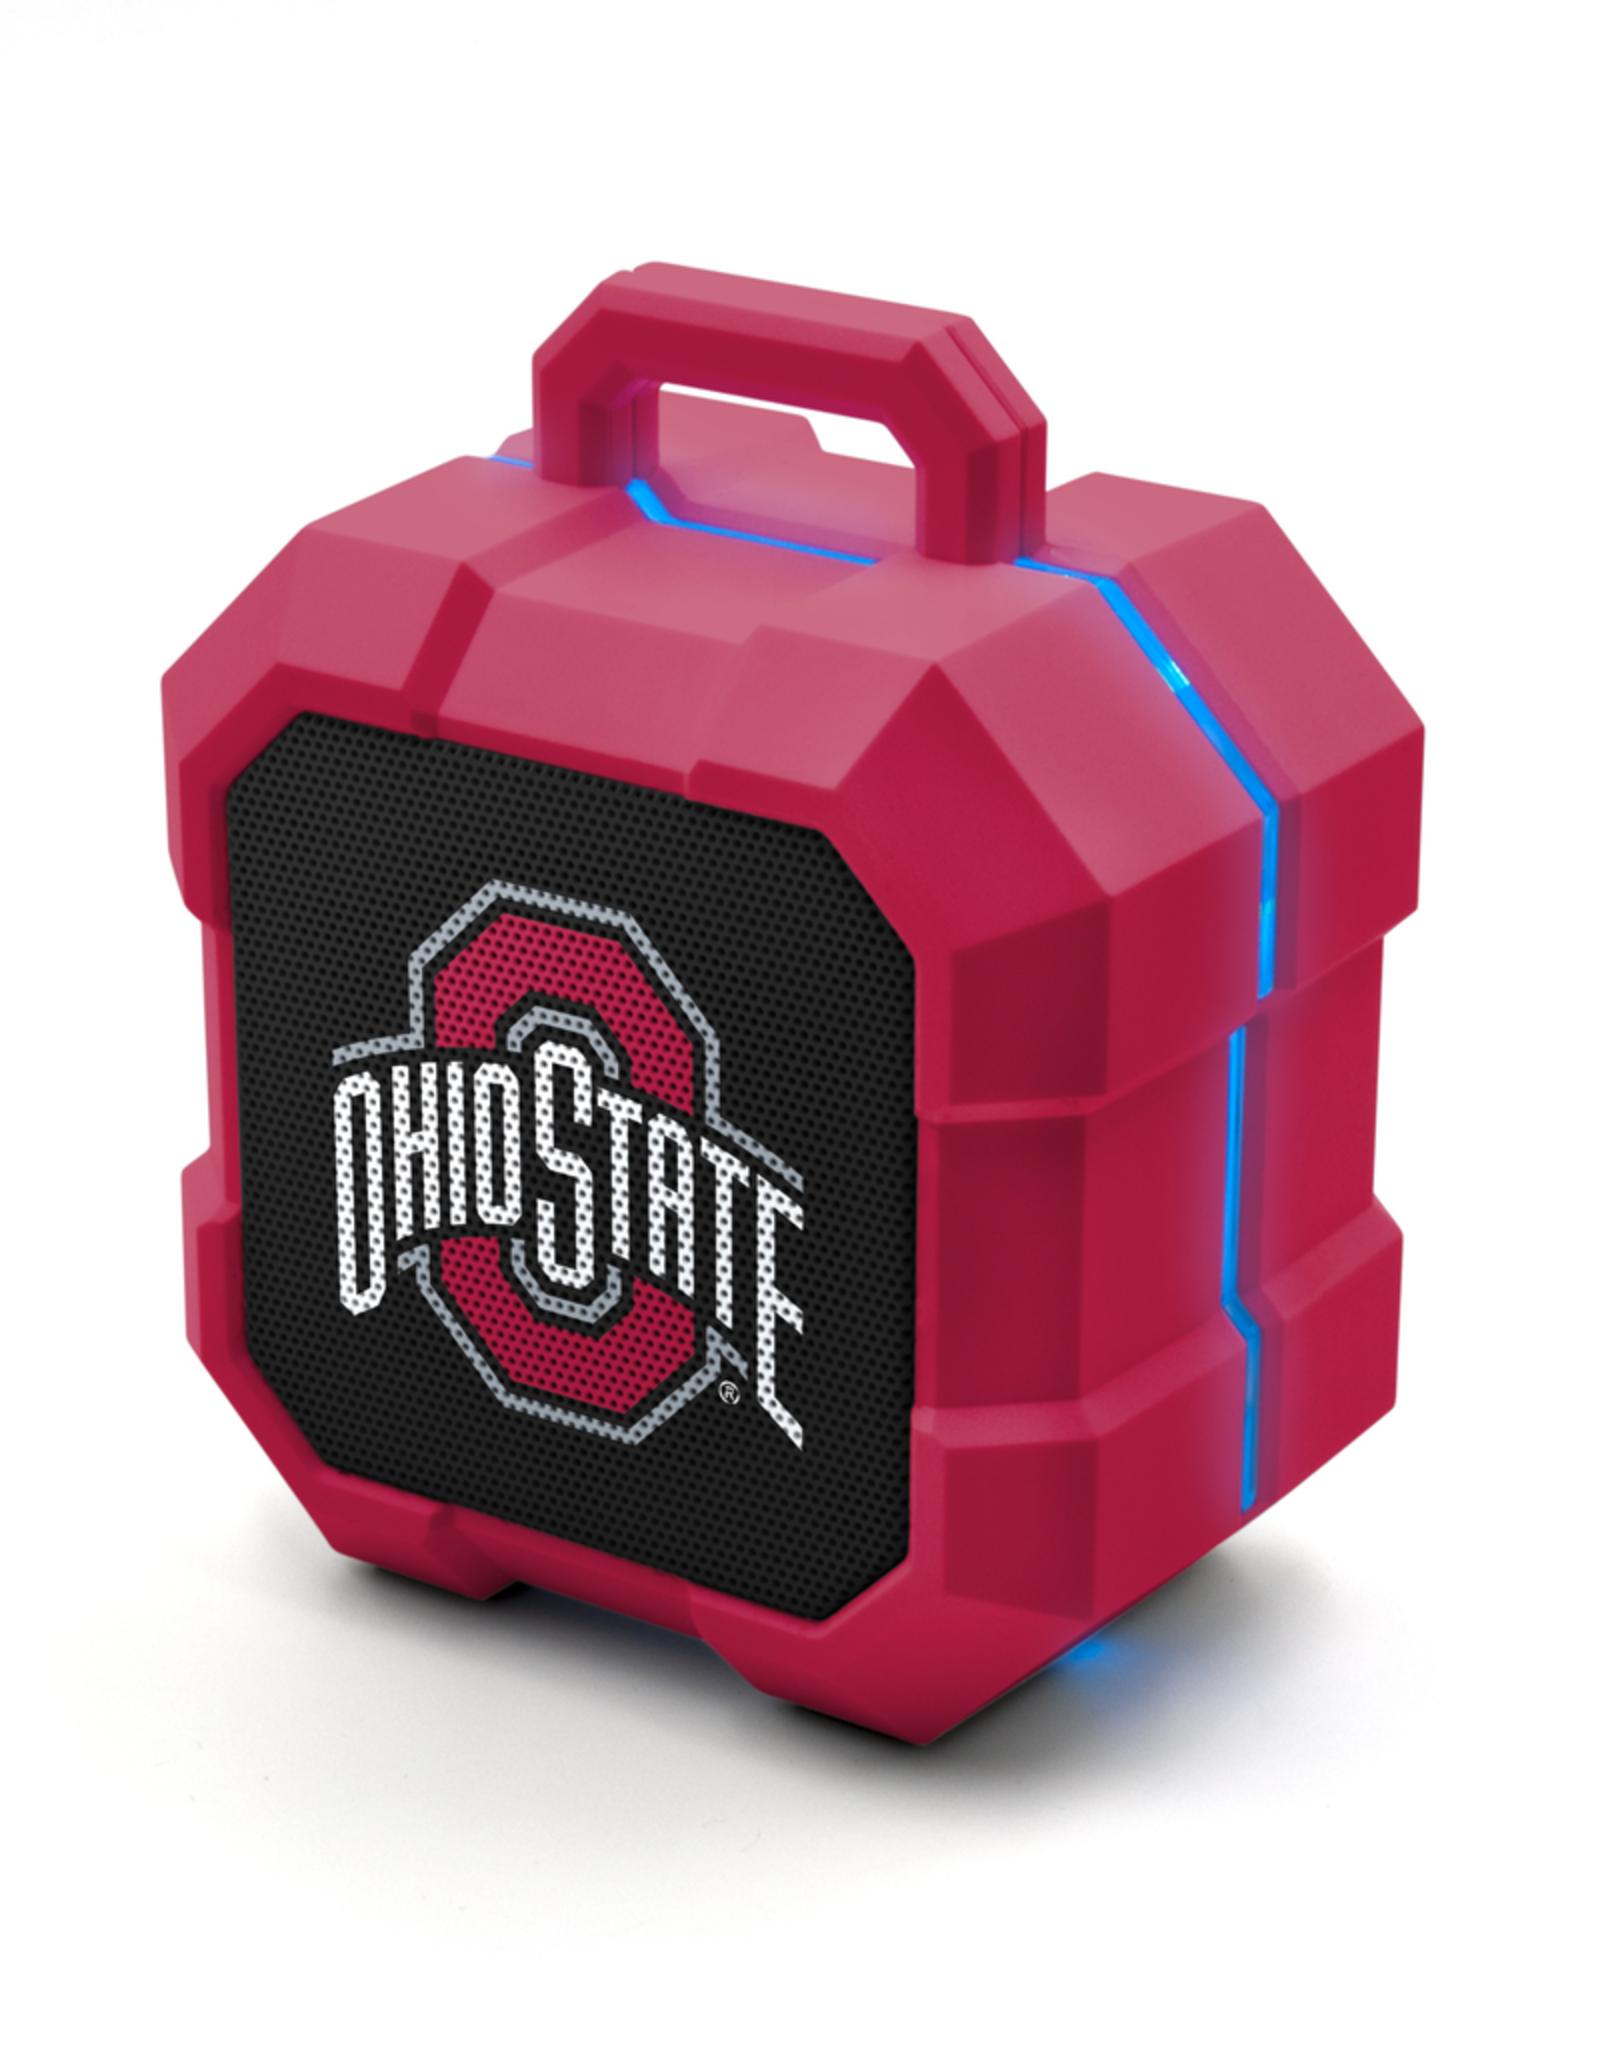 Quantity of 1 Ohio State Buckeyes Bottle Jersey Holder